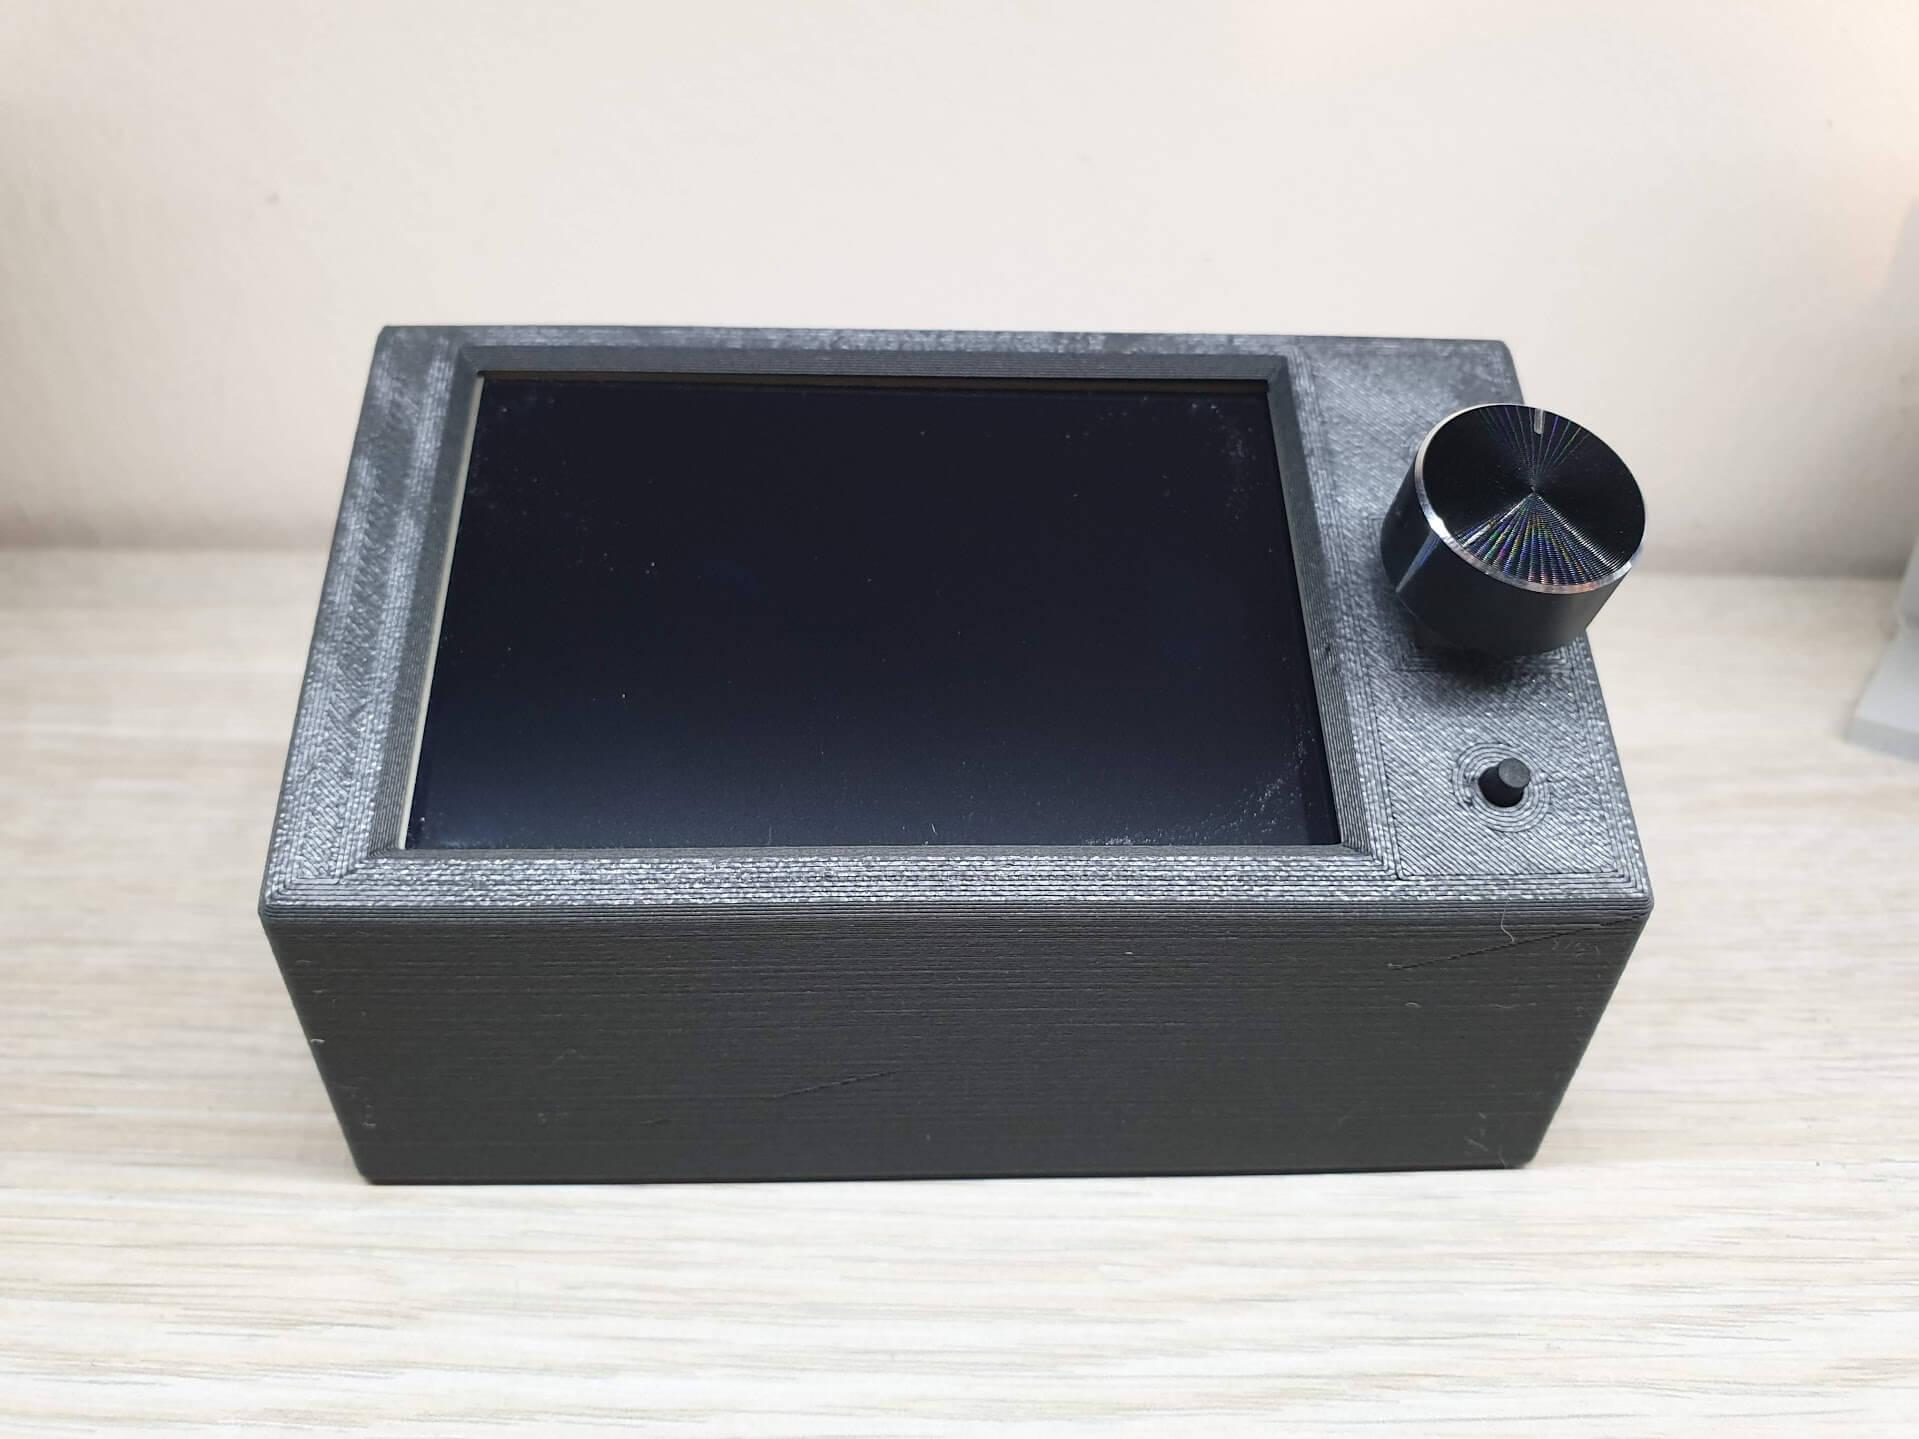 TFT35-V3.0-Sidewinder-X1-upgrade-2-1